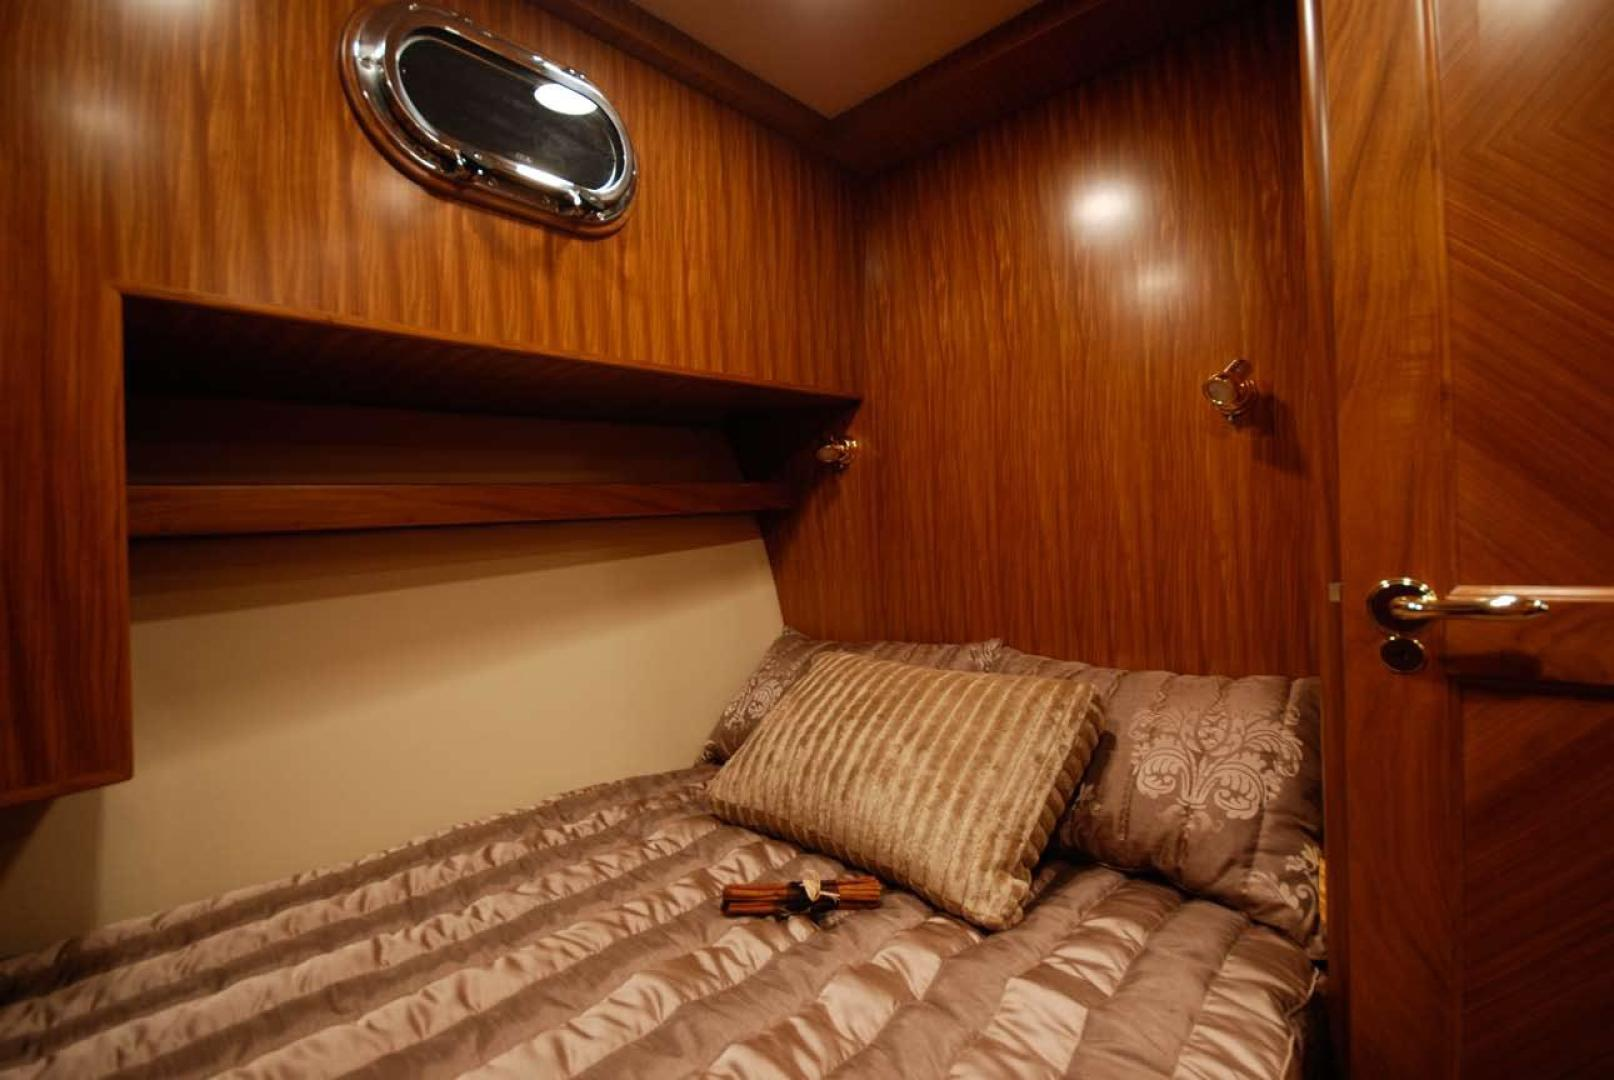 Clipper Motor Yachts-Cordova 52 2011 -Unknown-Singapore-Manufacturer Provided Image: Cordova 52-385779 | Thumbnail